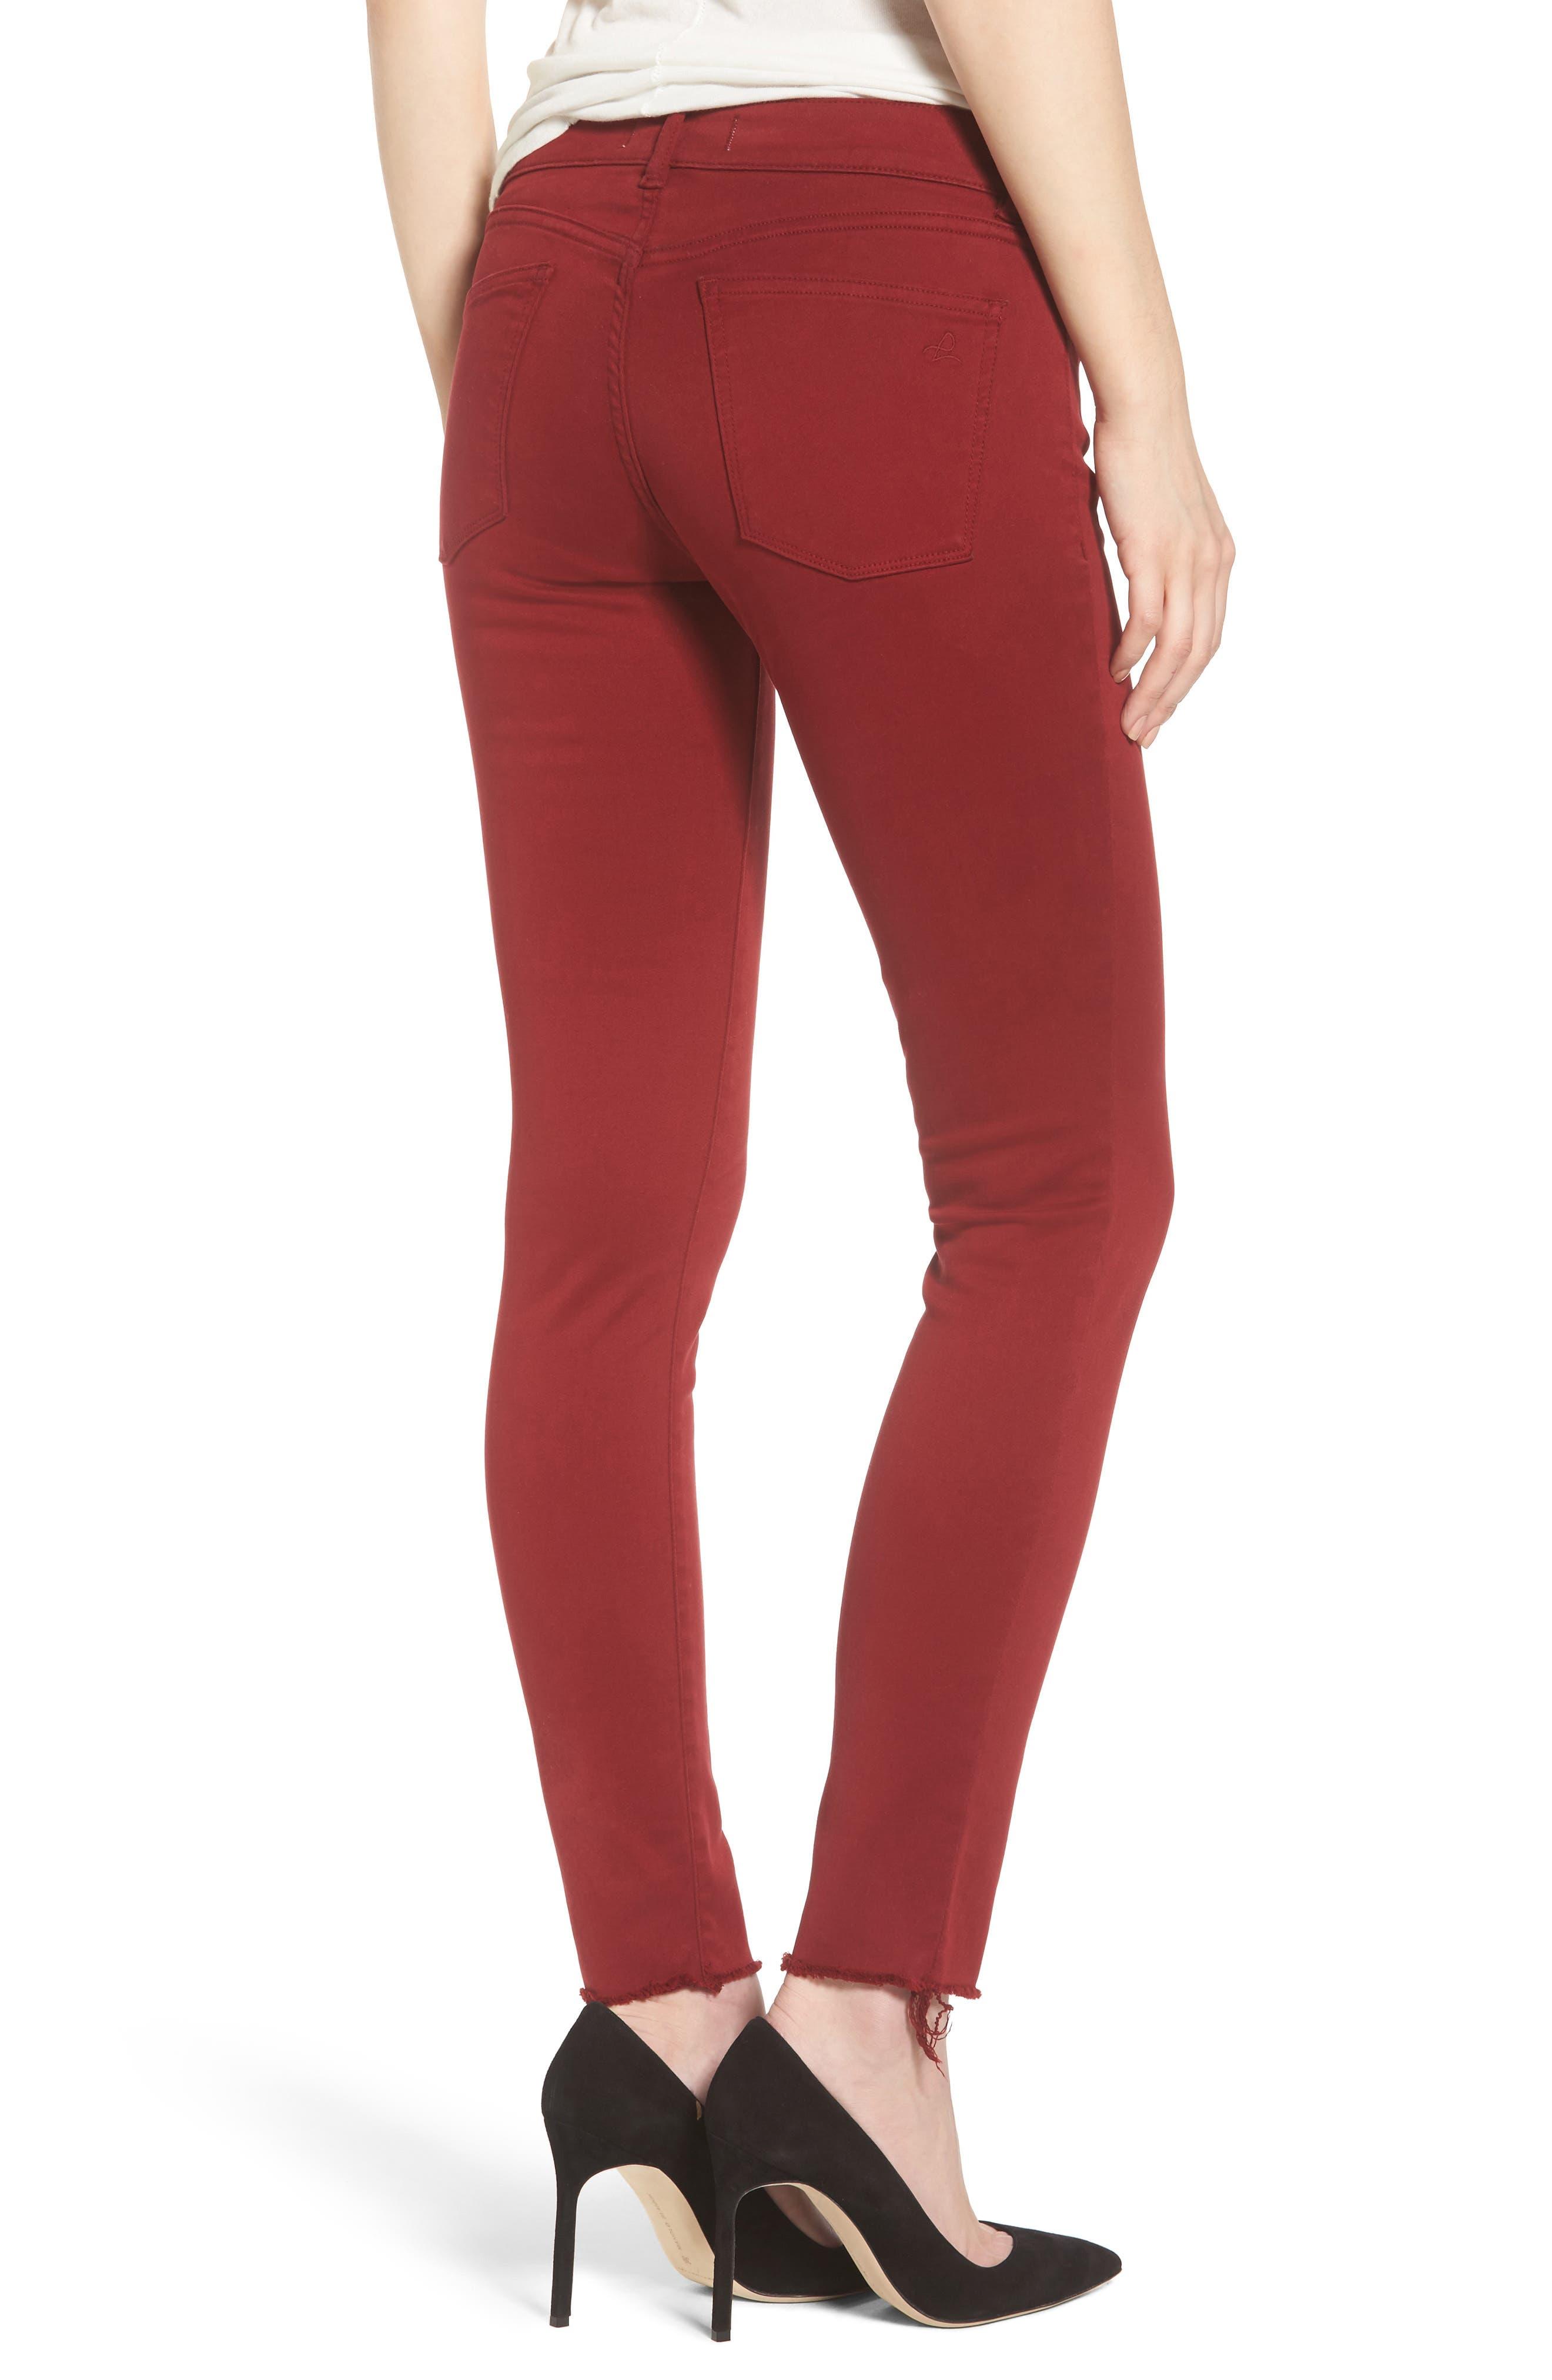 Emma Power Legging Jeans,                             Alternate thumbnail 2, color,                             Rhubarb